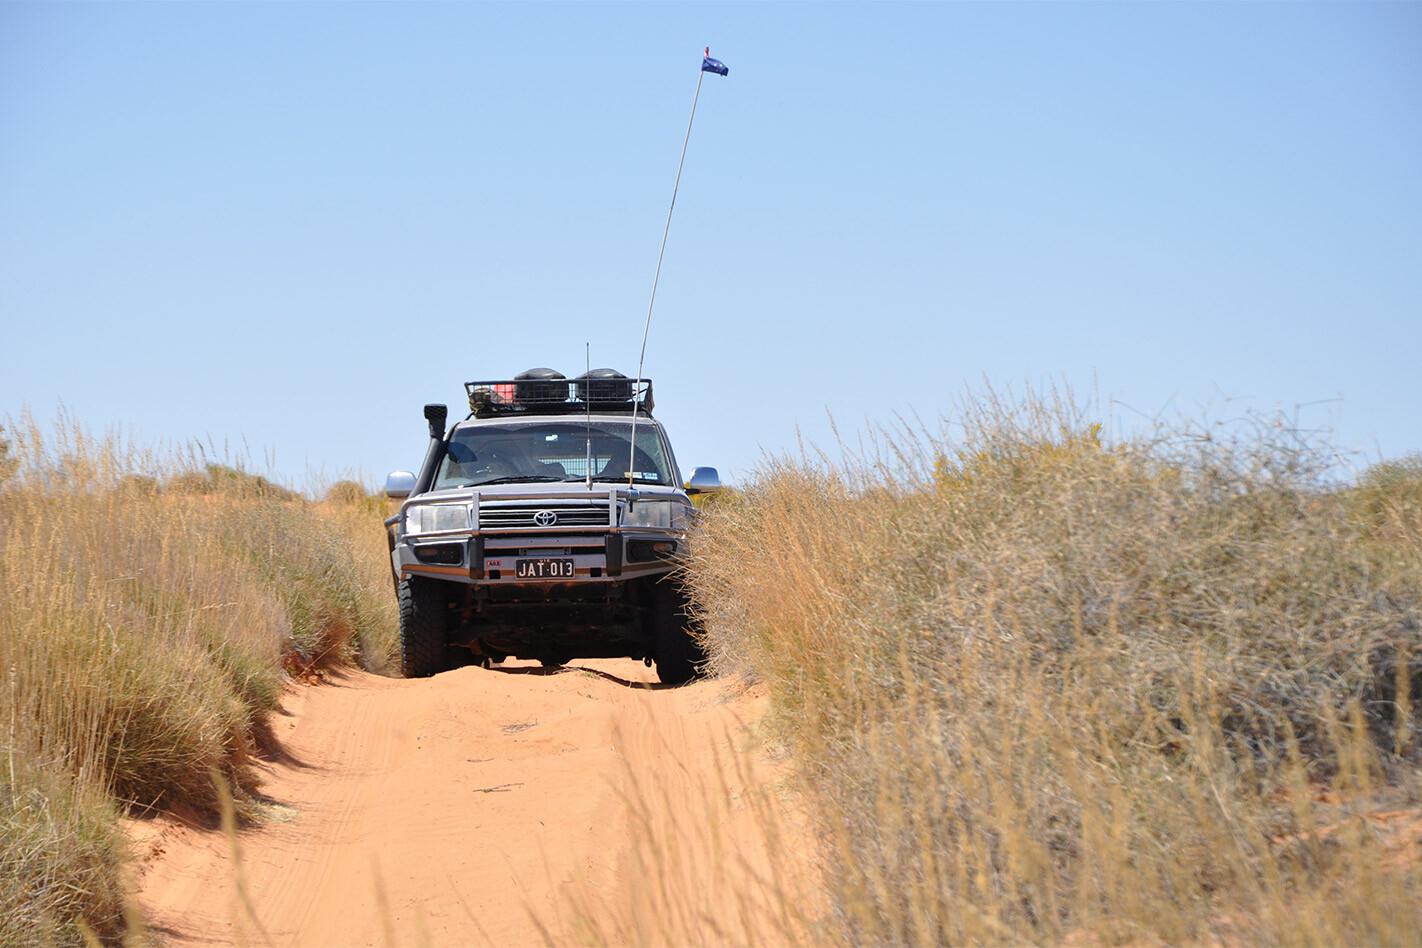 Simpson Desert 4x4